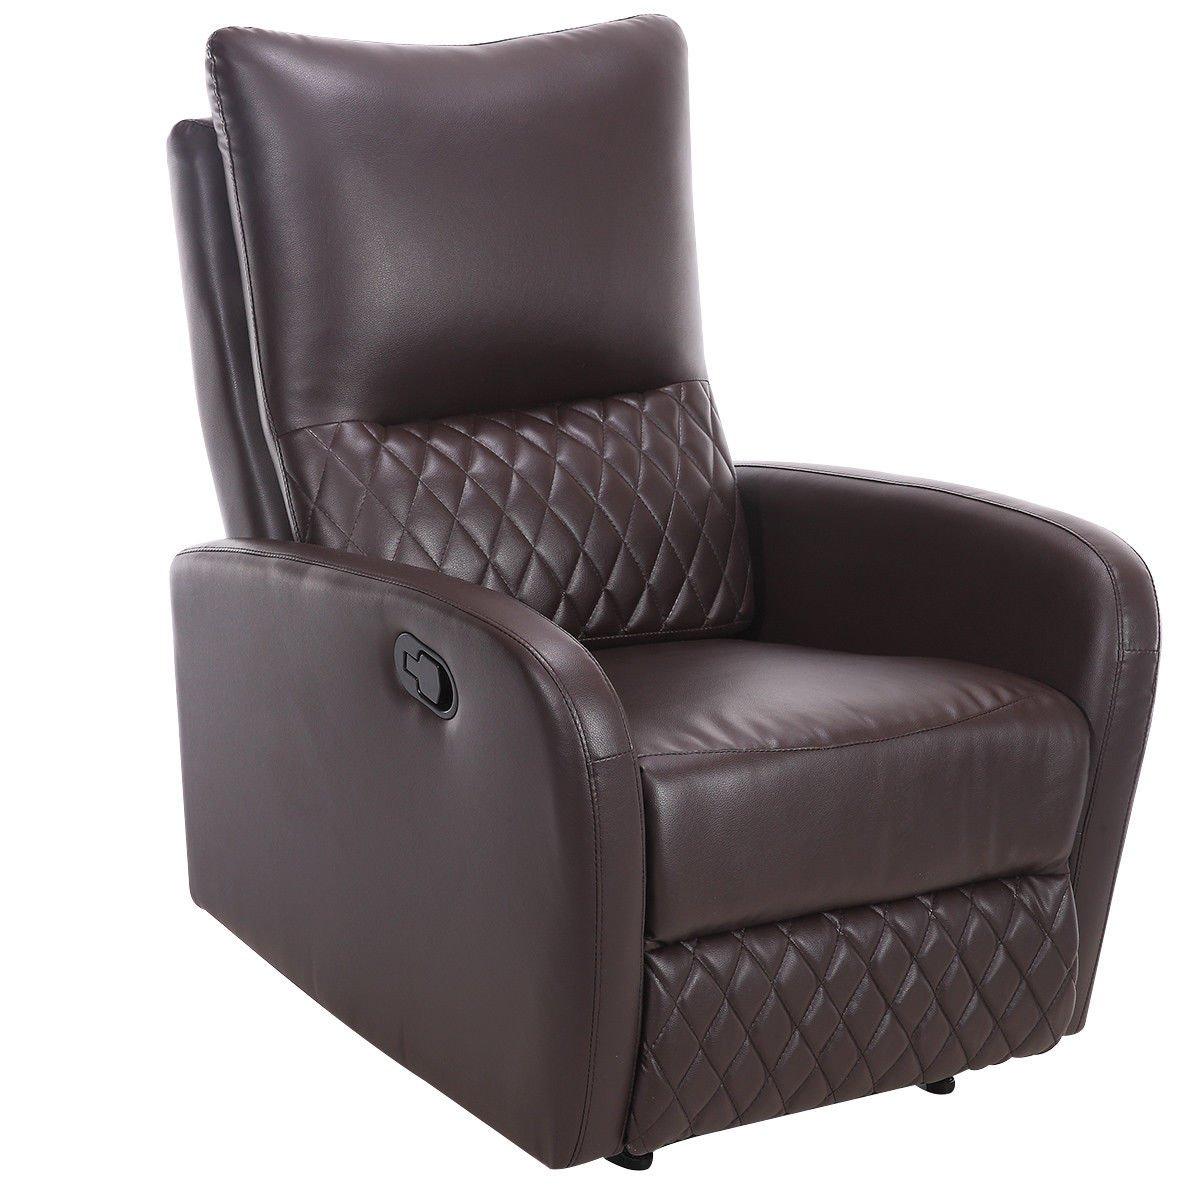 Giantex Recliner Chair Manual PU Leather Ergonomic Theater Reclining (Brown)